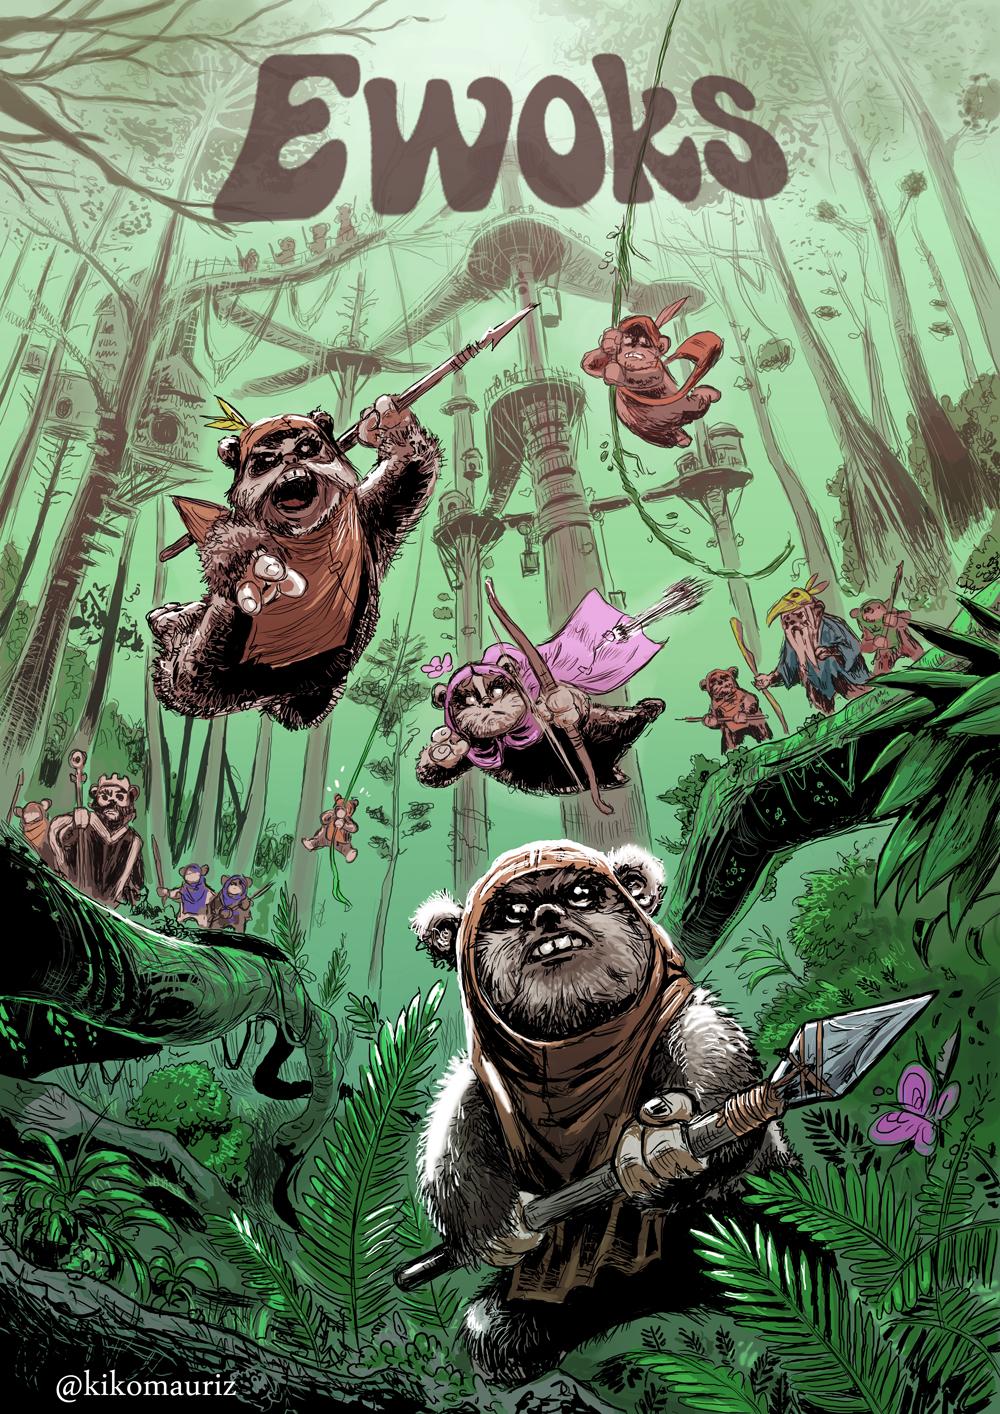 Ewoks by kikomauriz on deviantart - Ewok wallpaper ...